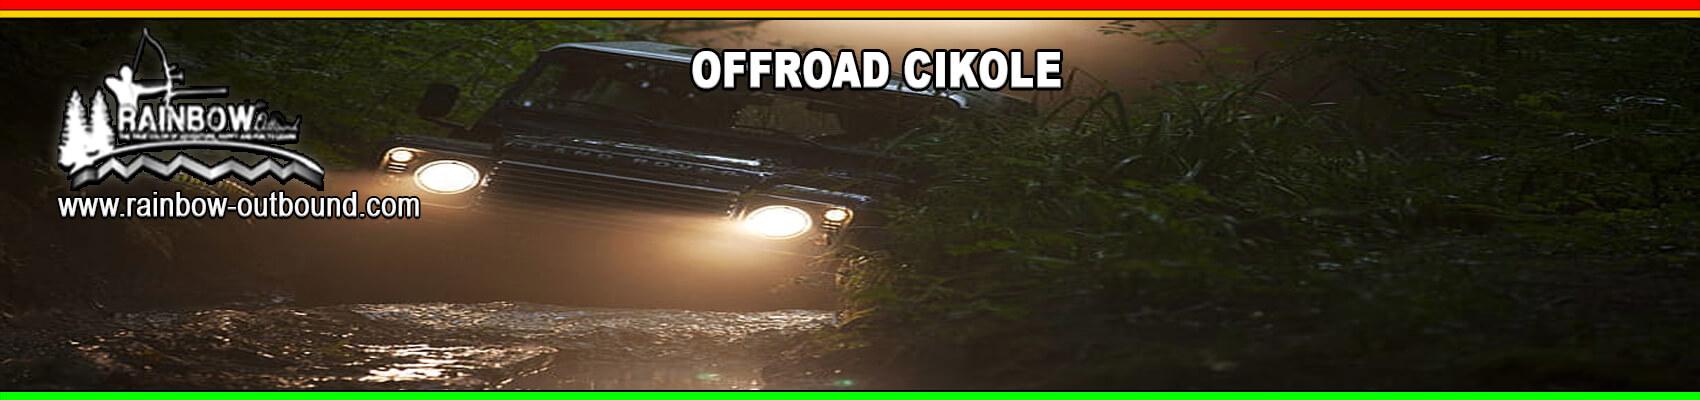 offroad cikole